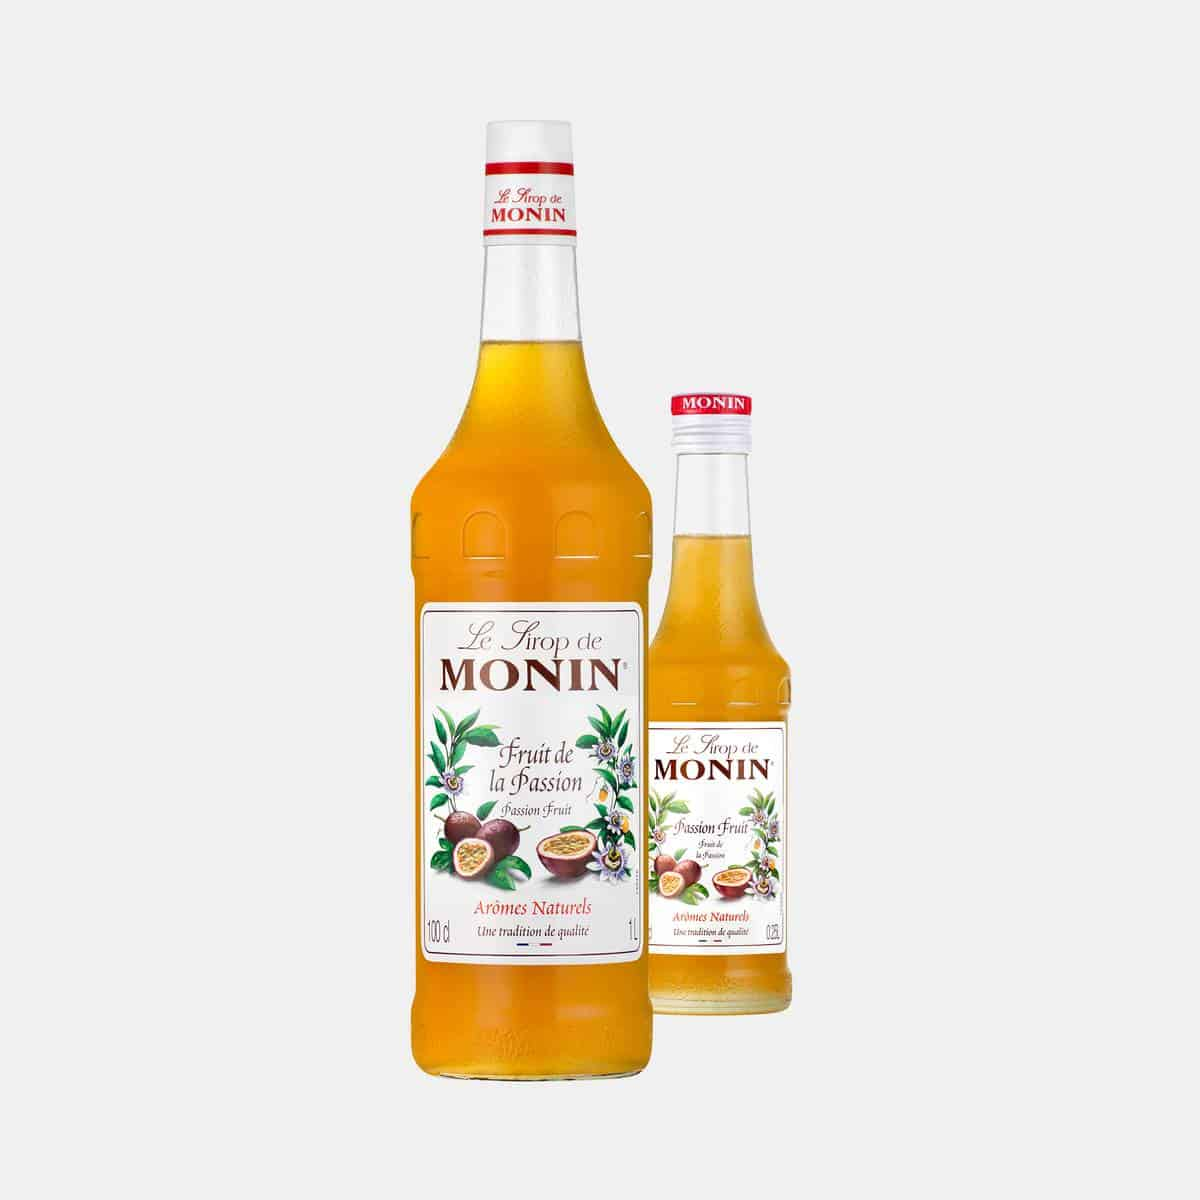 Monin Passion Fruit Syrup Glass Bottles